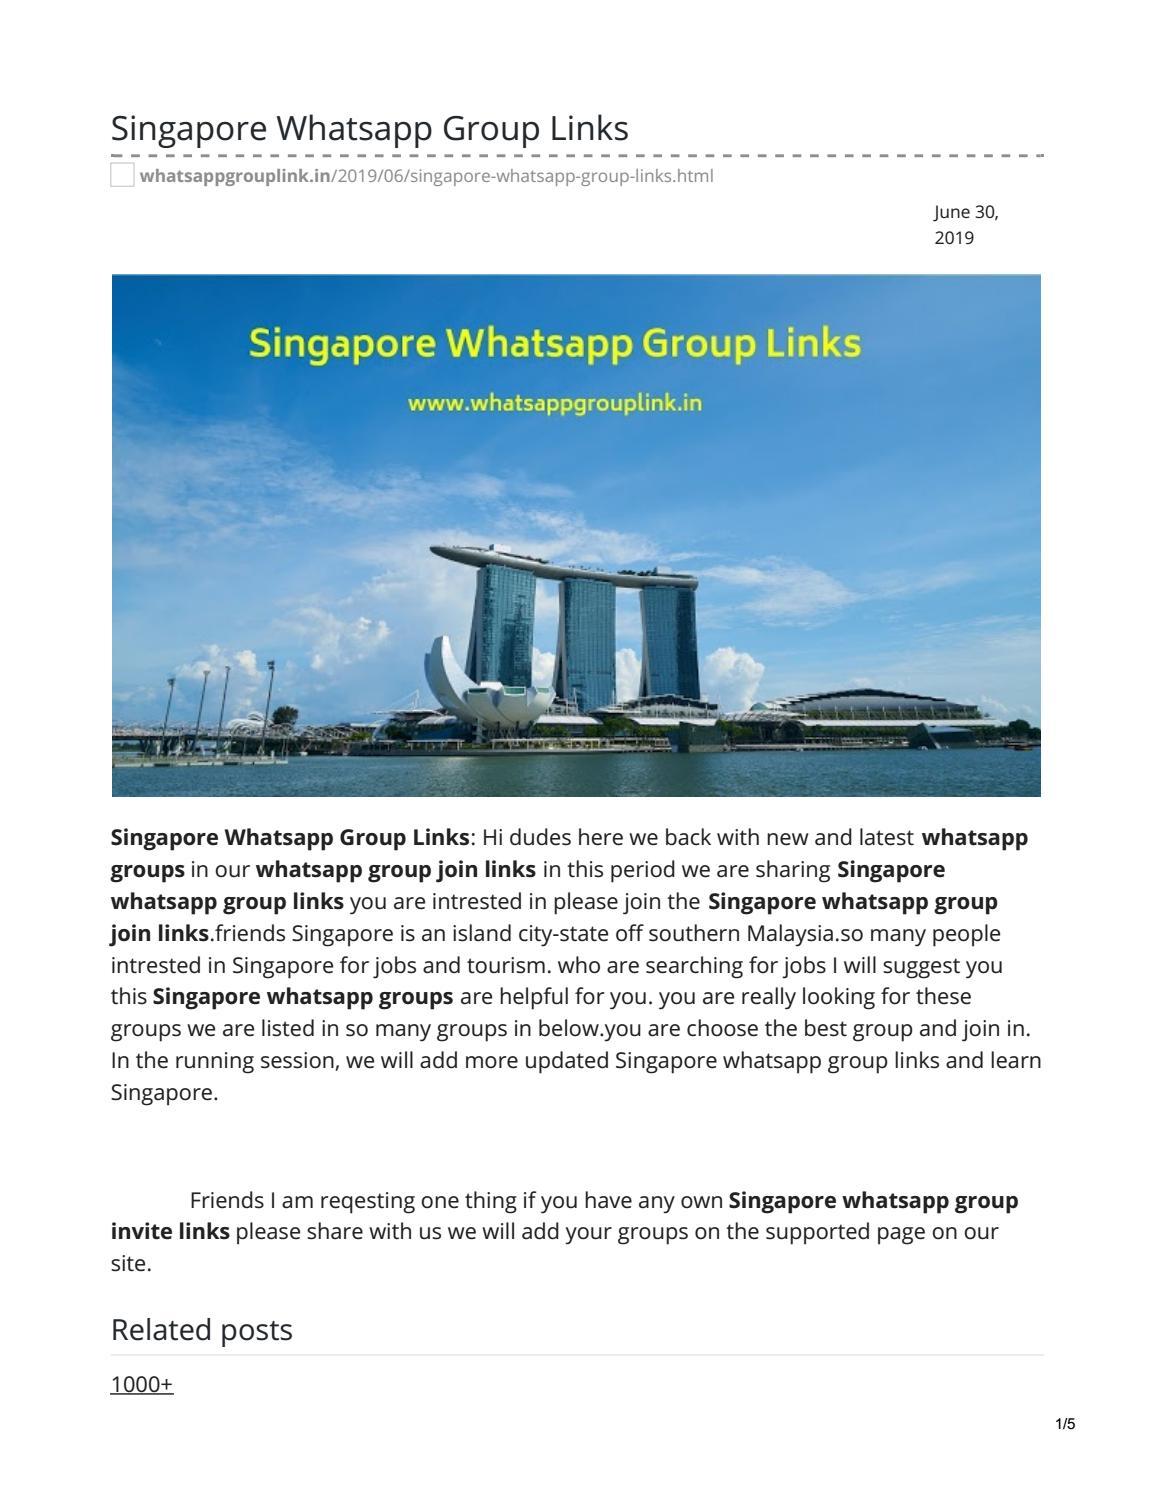 Singapore Whatsapp Group Links by whatsappgrouplink77 - issuu